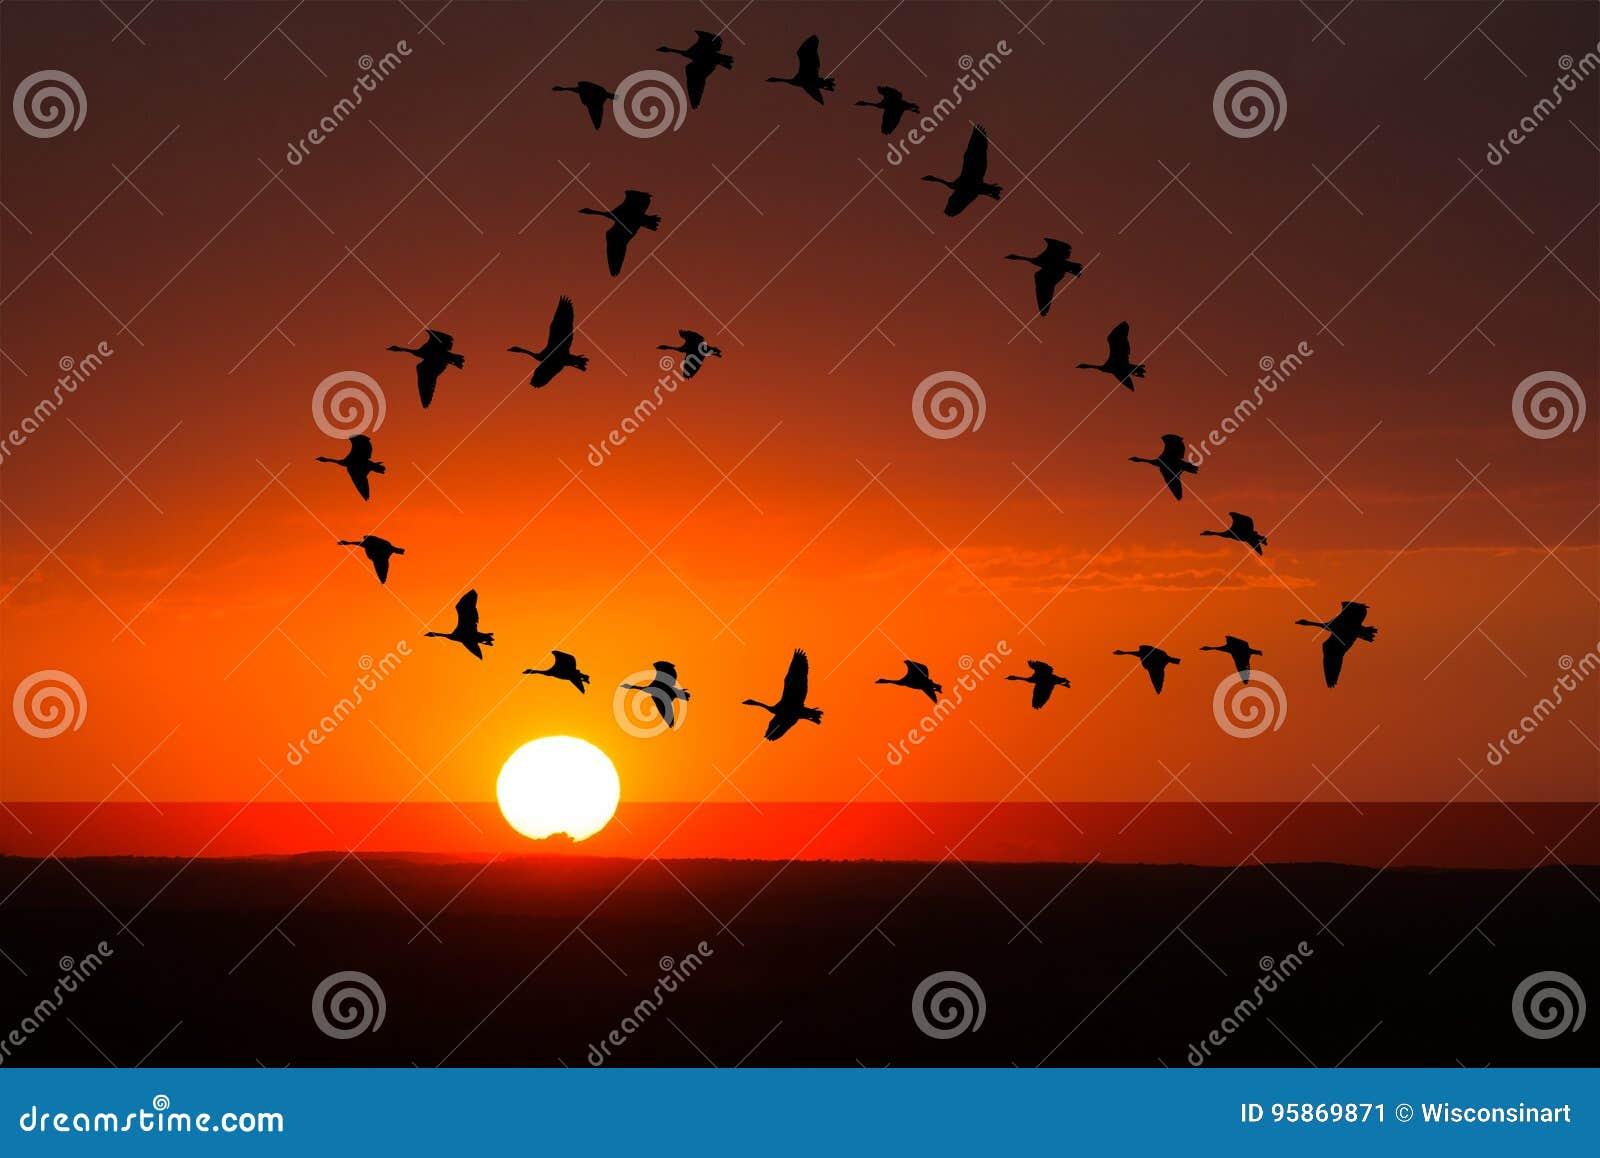 Sunrise, Sunset Love, Romance, Birds